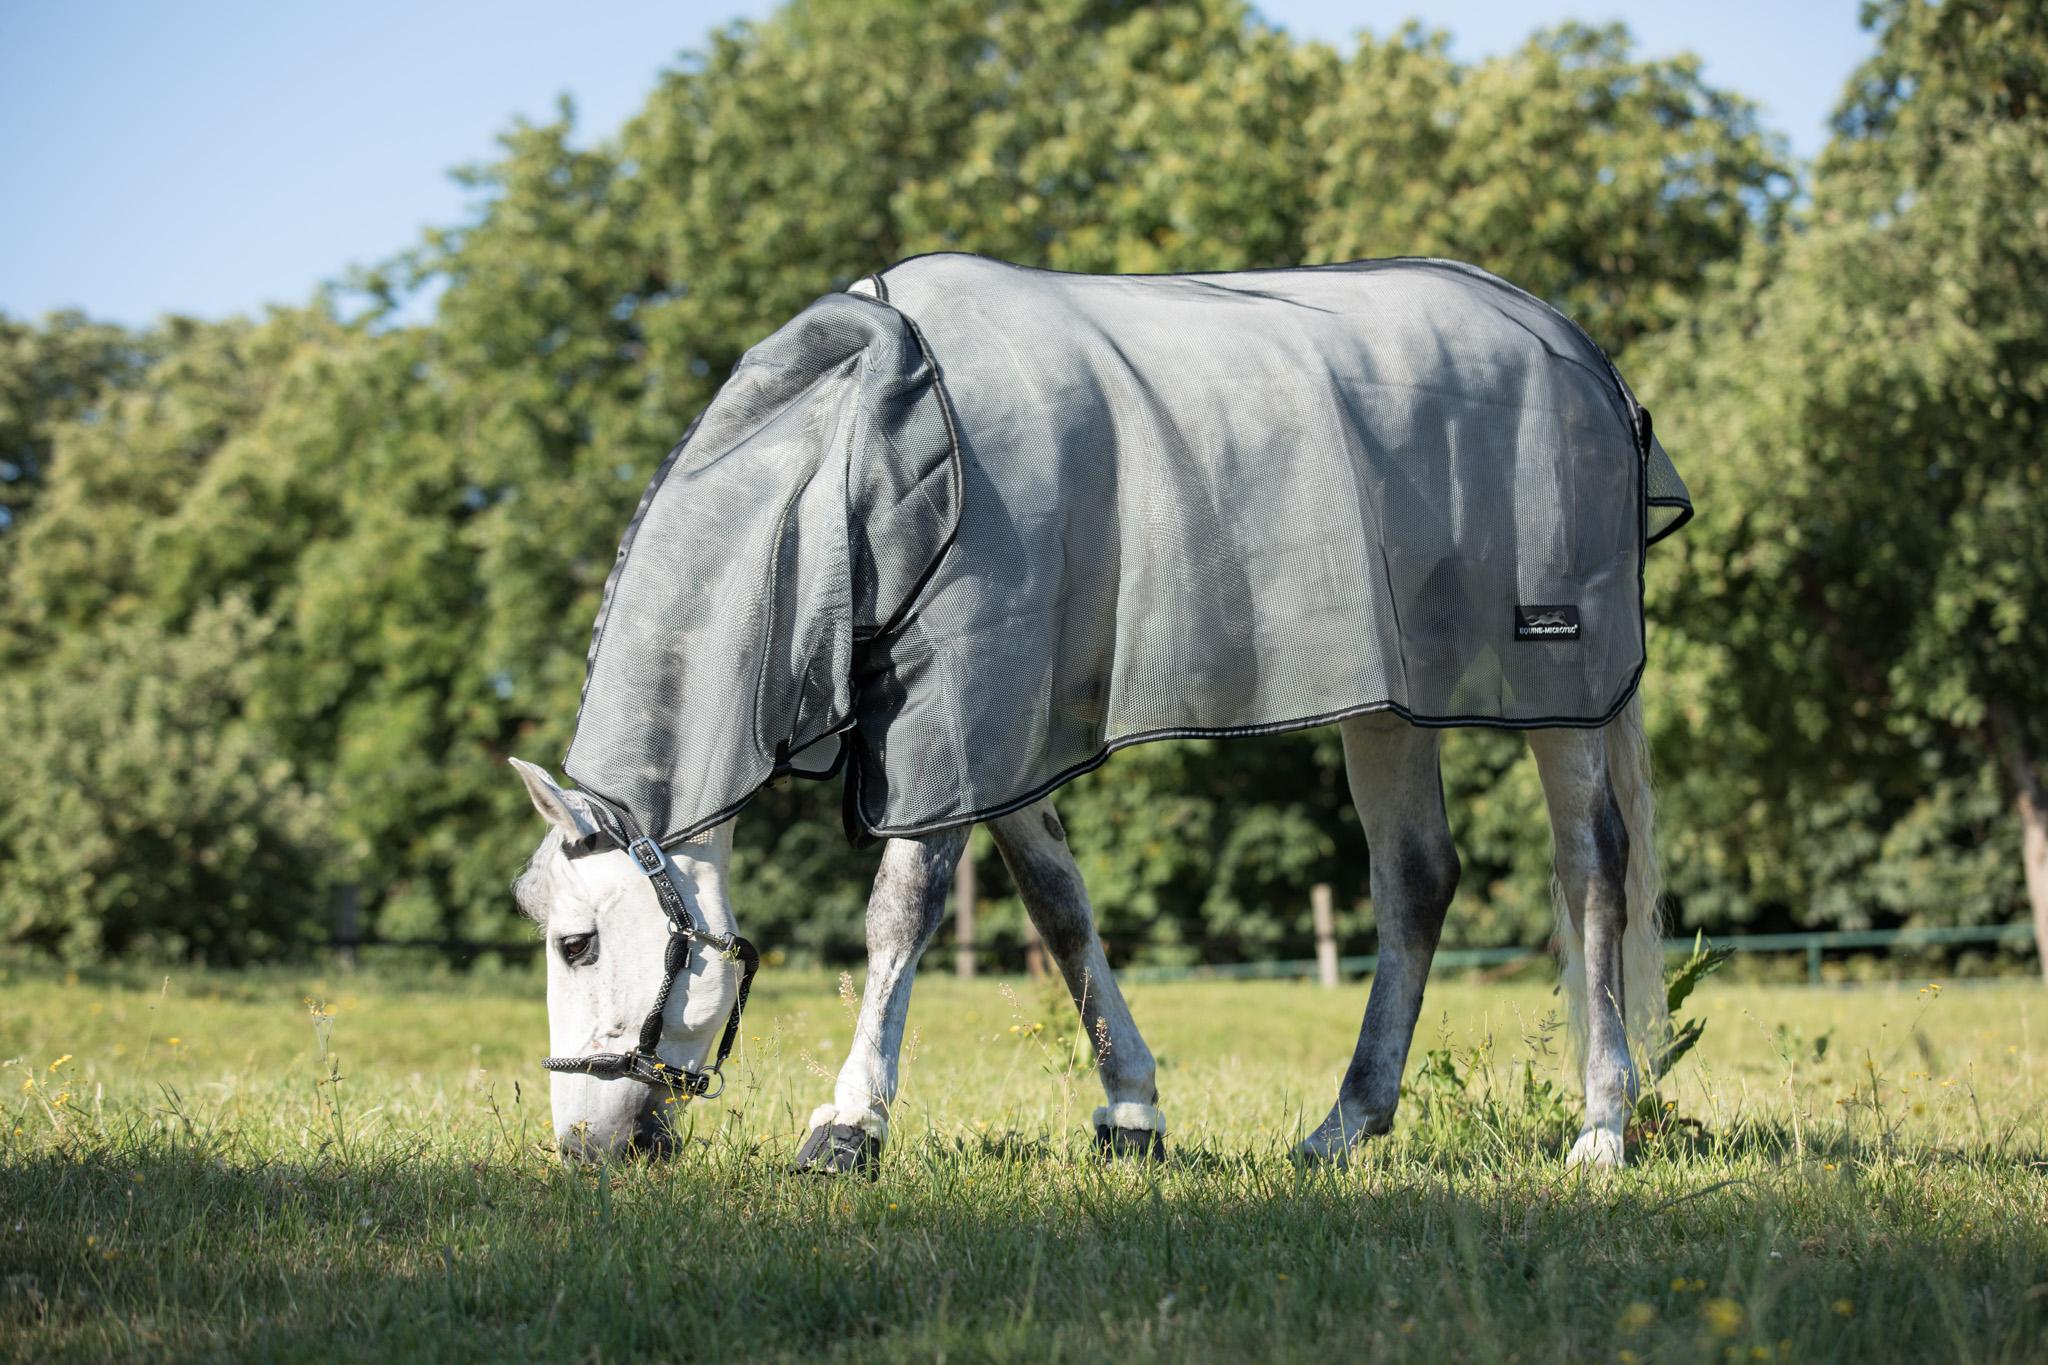 equine-microtec-marvin-vroomen-200601-FS193995